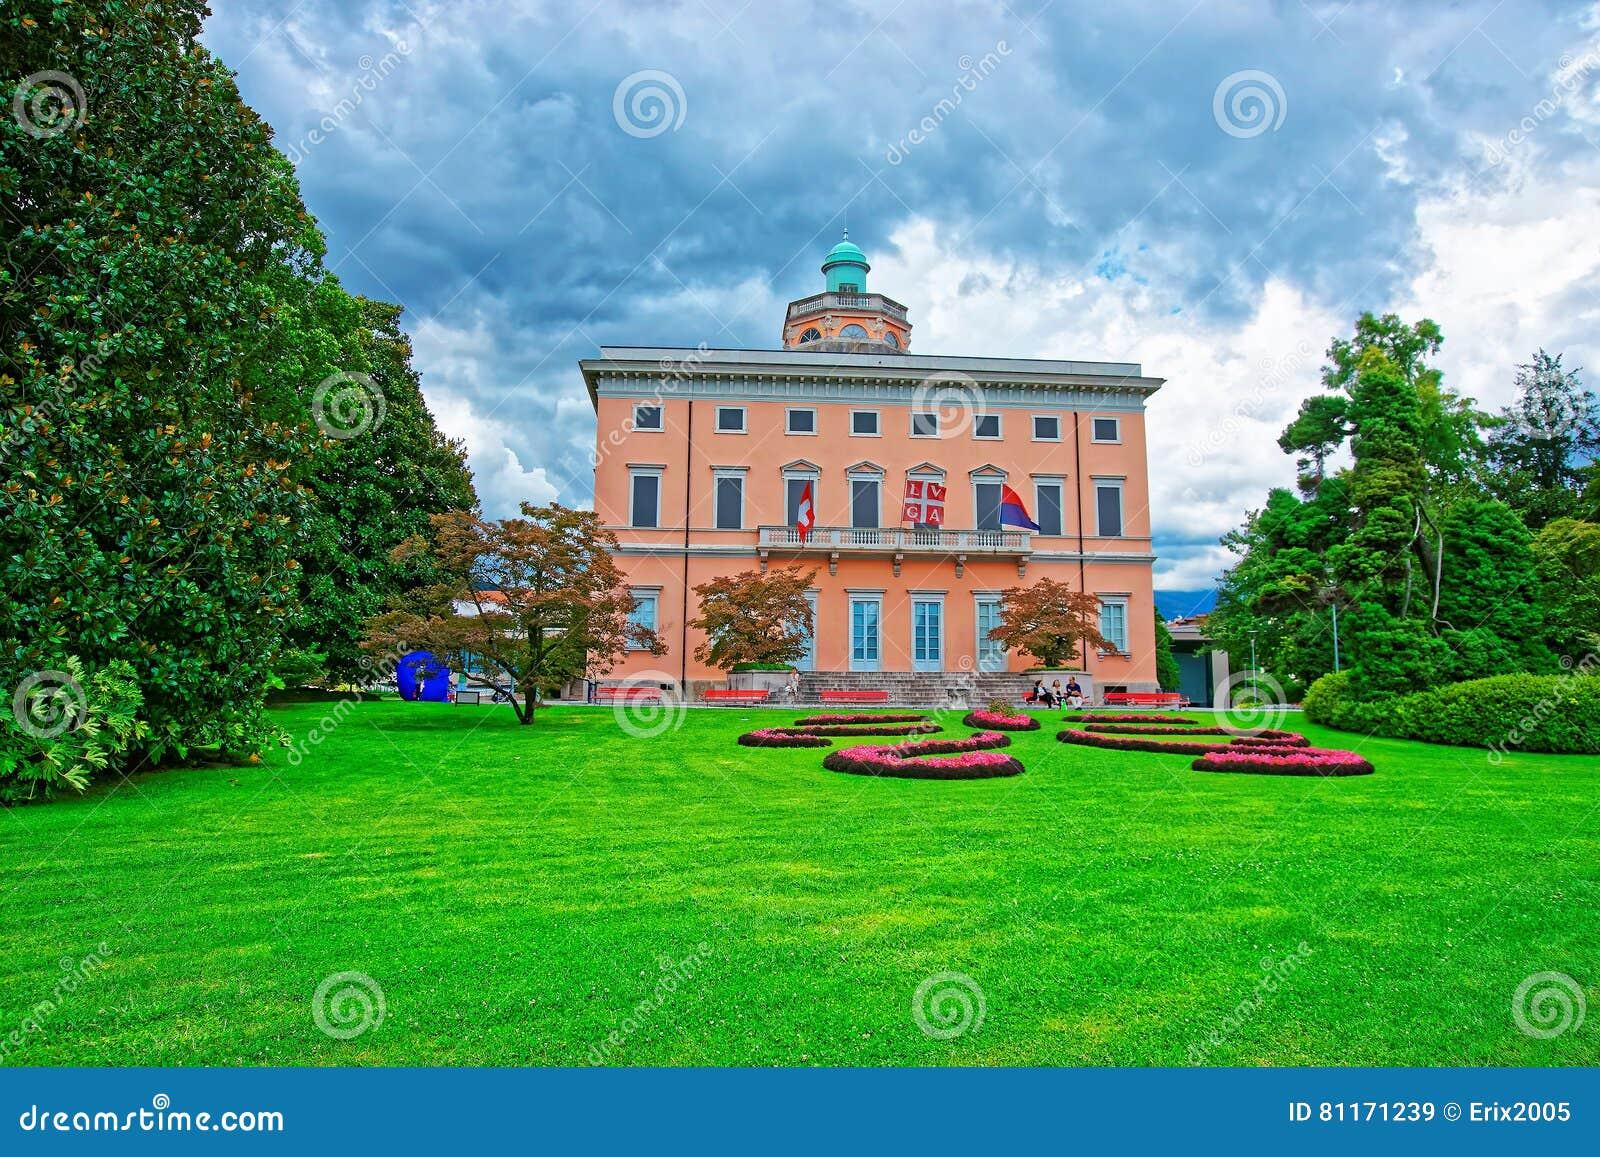 Villa op de botanische tuin van Ciani in Lugano Ticino Zwitserland